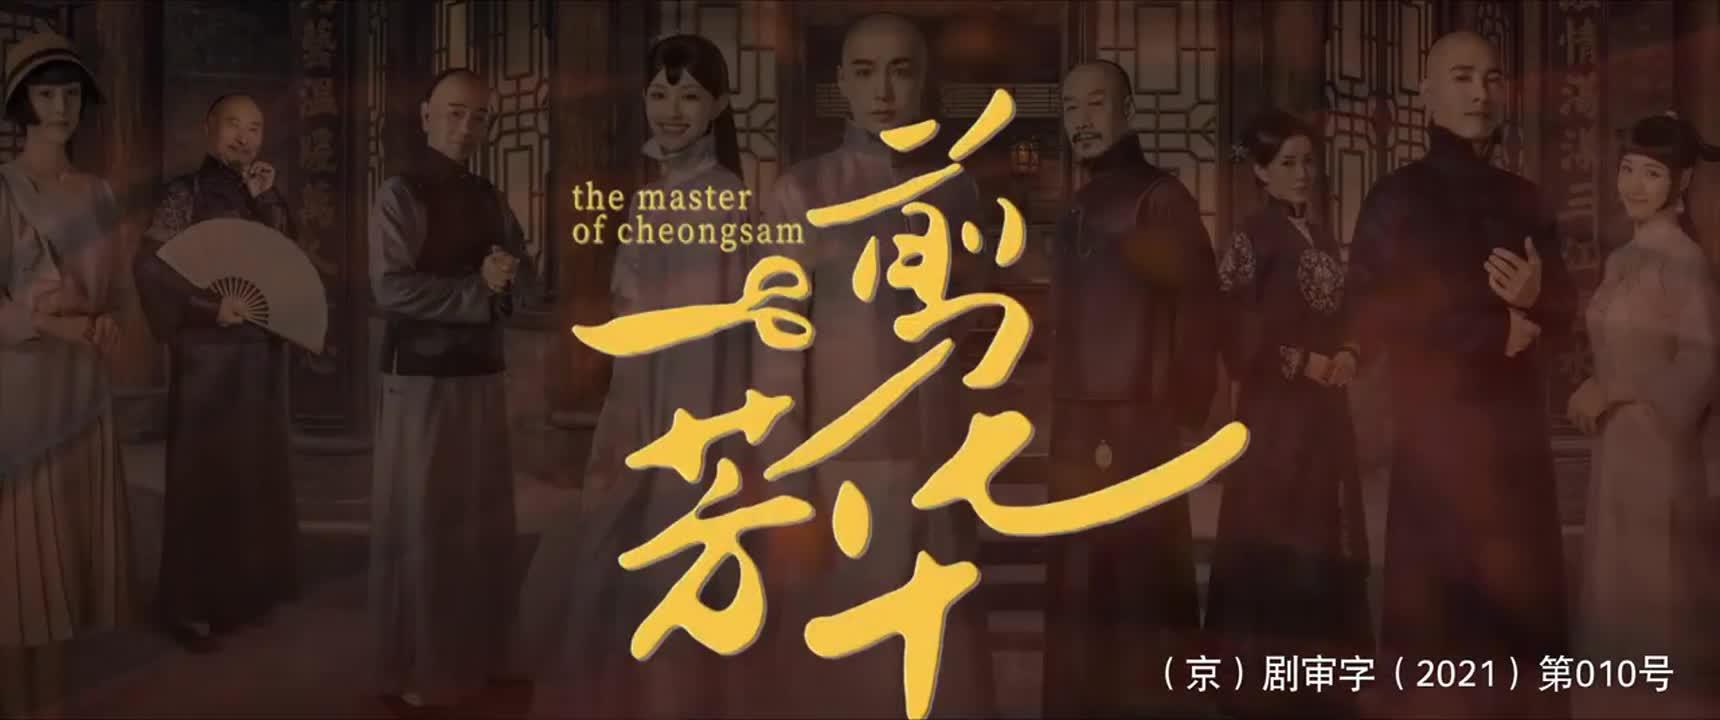 The Master of Cheongsam (2021)